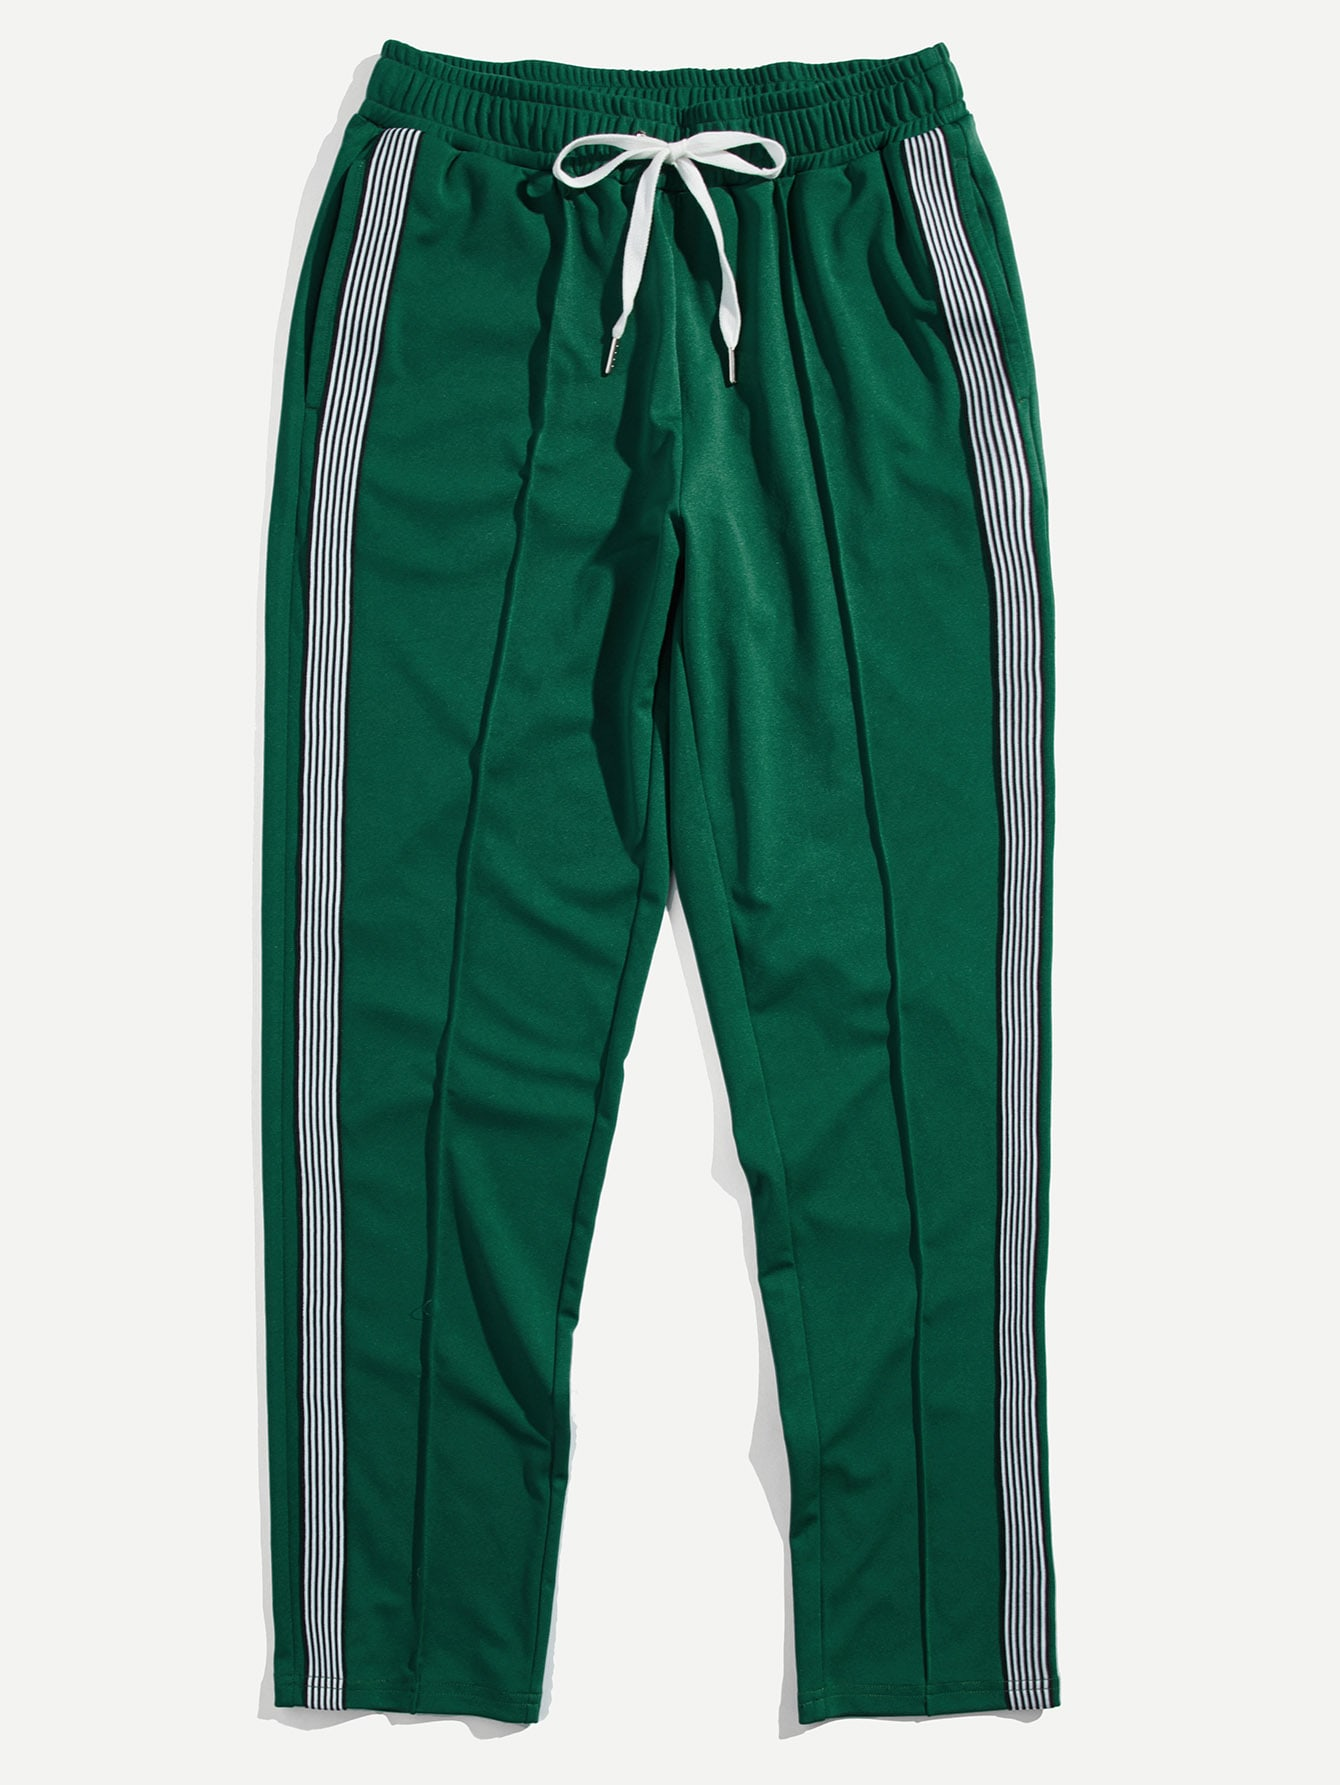 Men Striped Tape Side Drawstring Sweatpants men striped tape side drawstring shorts